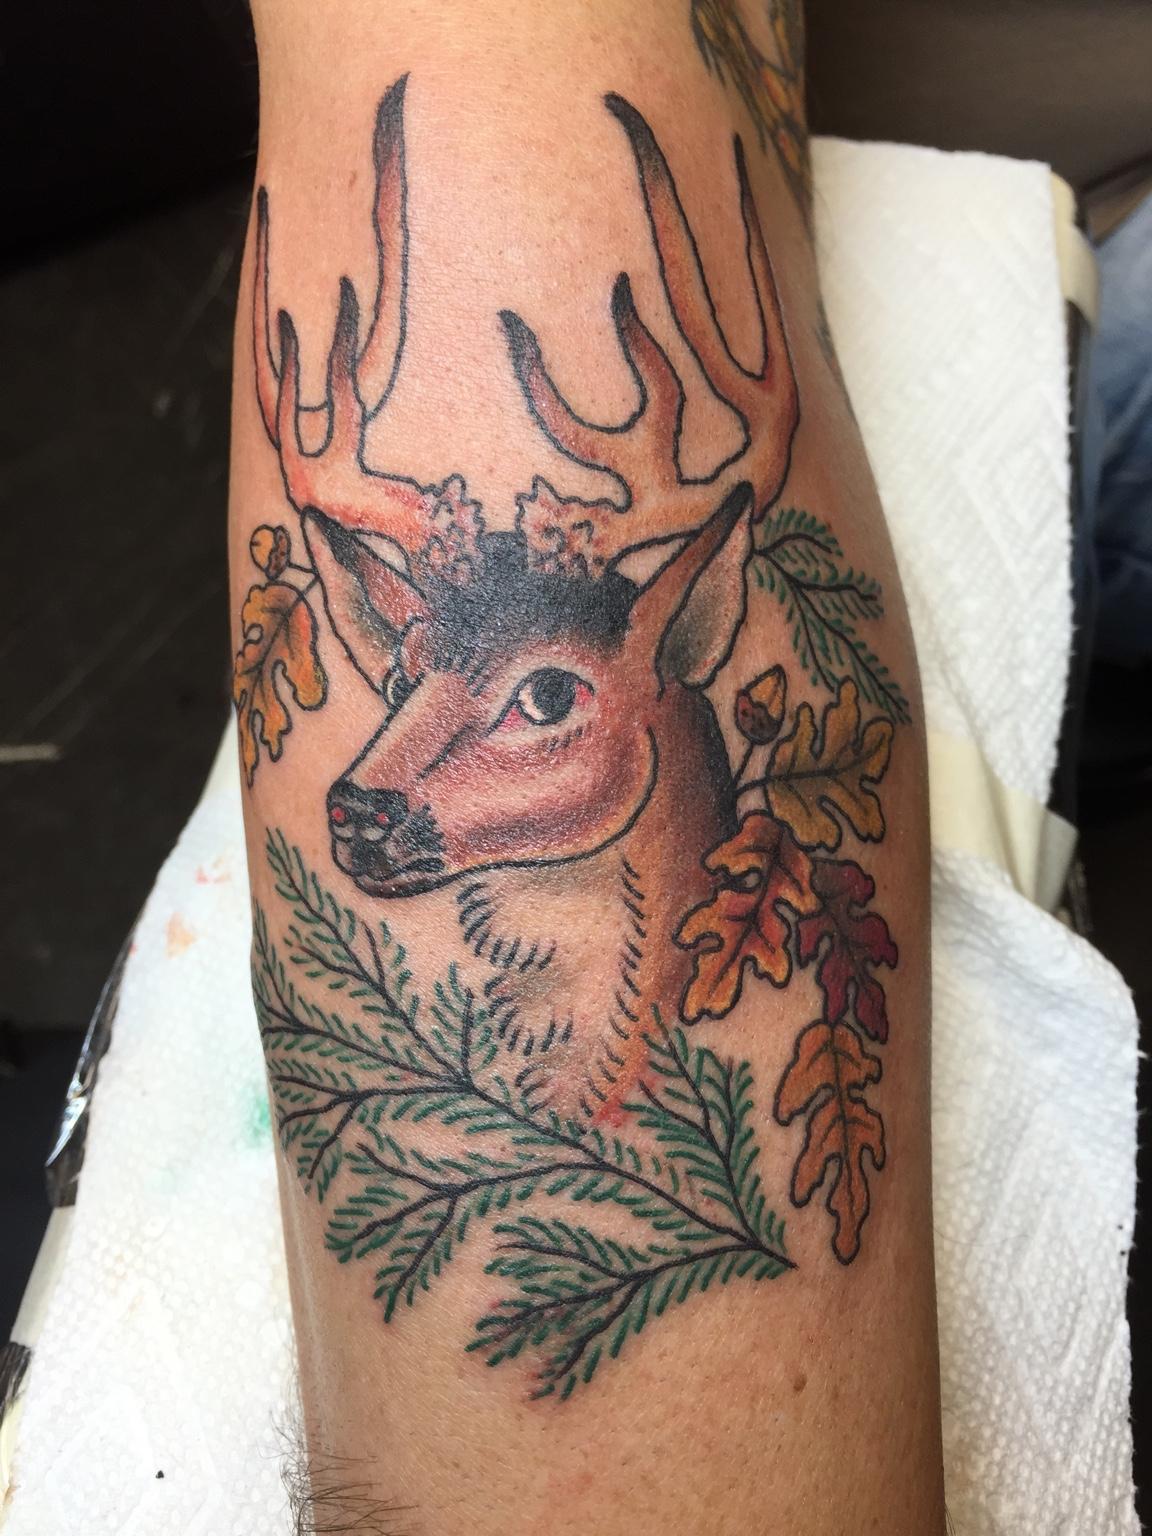 New Tattoo Sailor Jerry Deer New Jersey Hunters